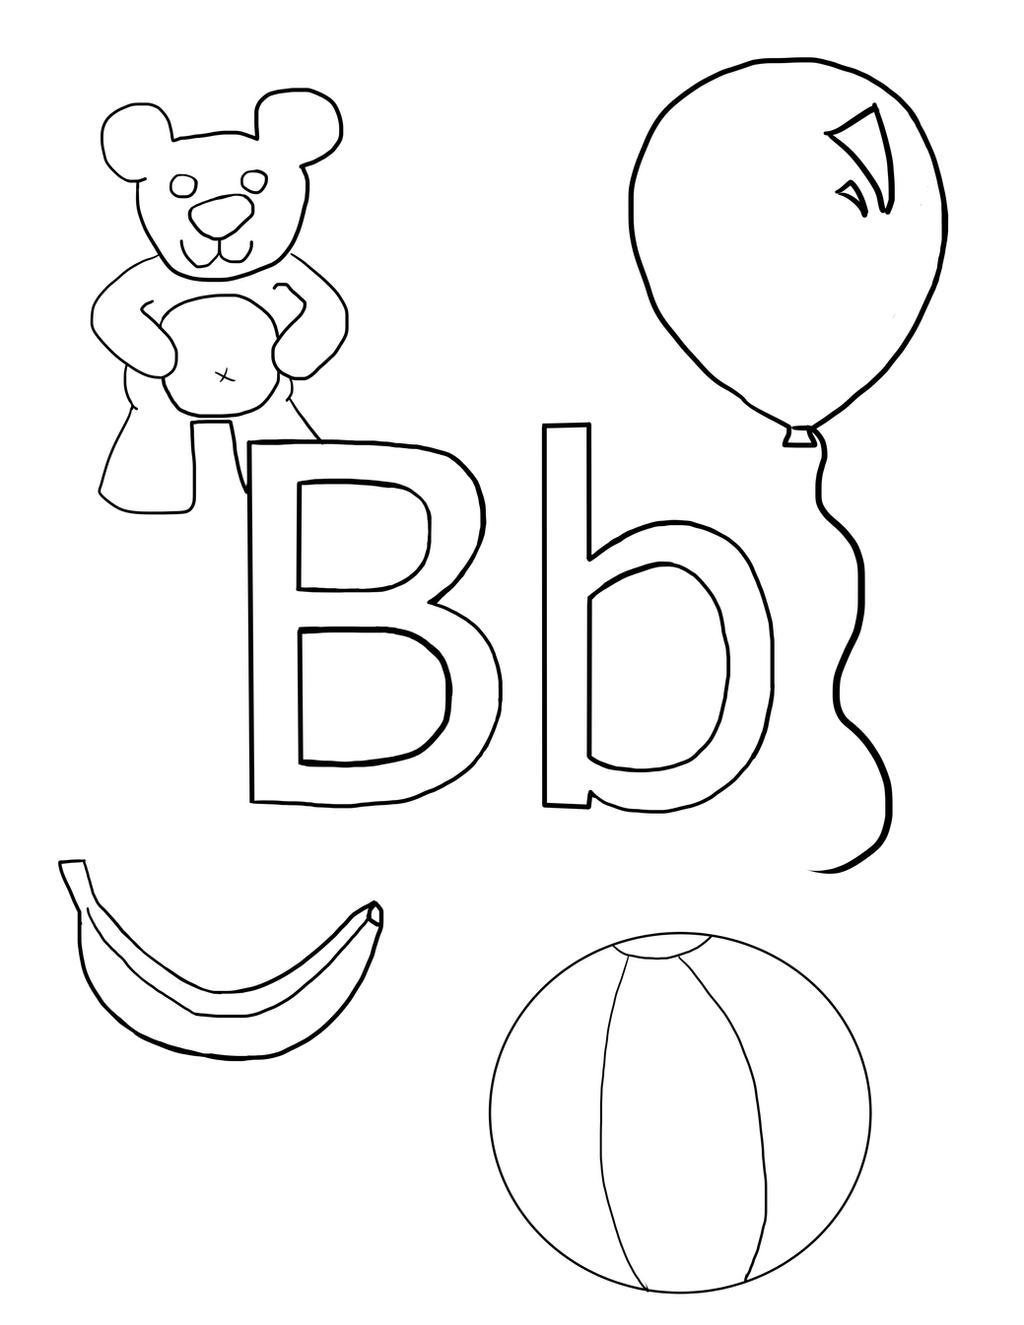 Letter B Coloring Sheet By AudioBot11 On DeviantArt